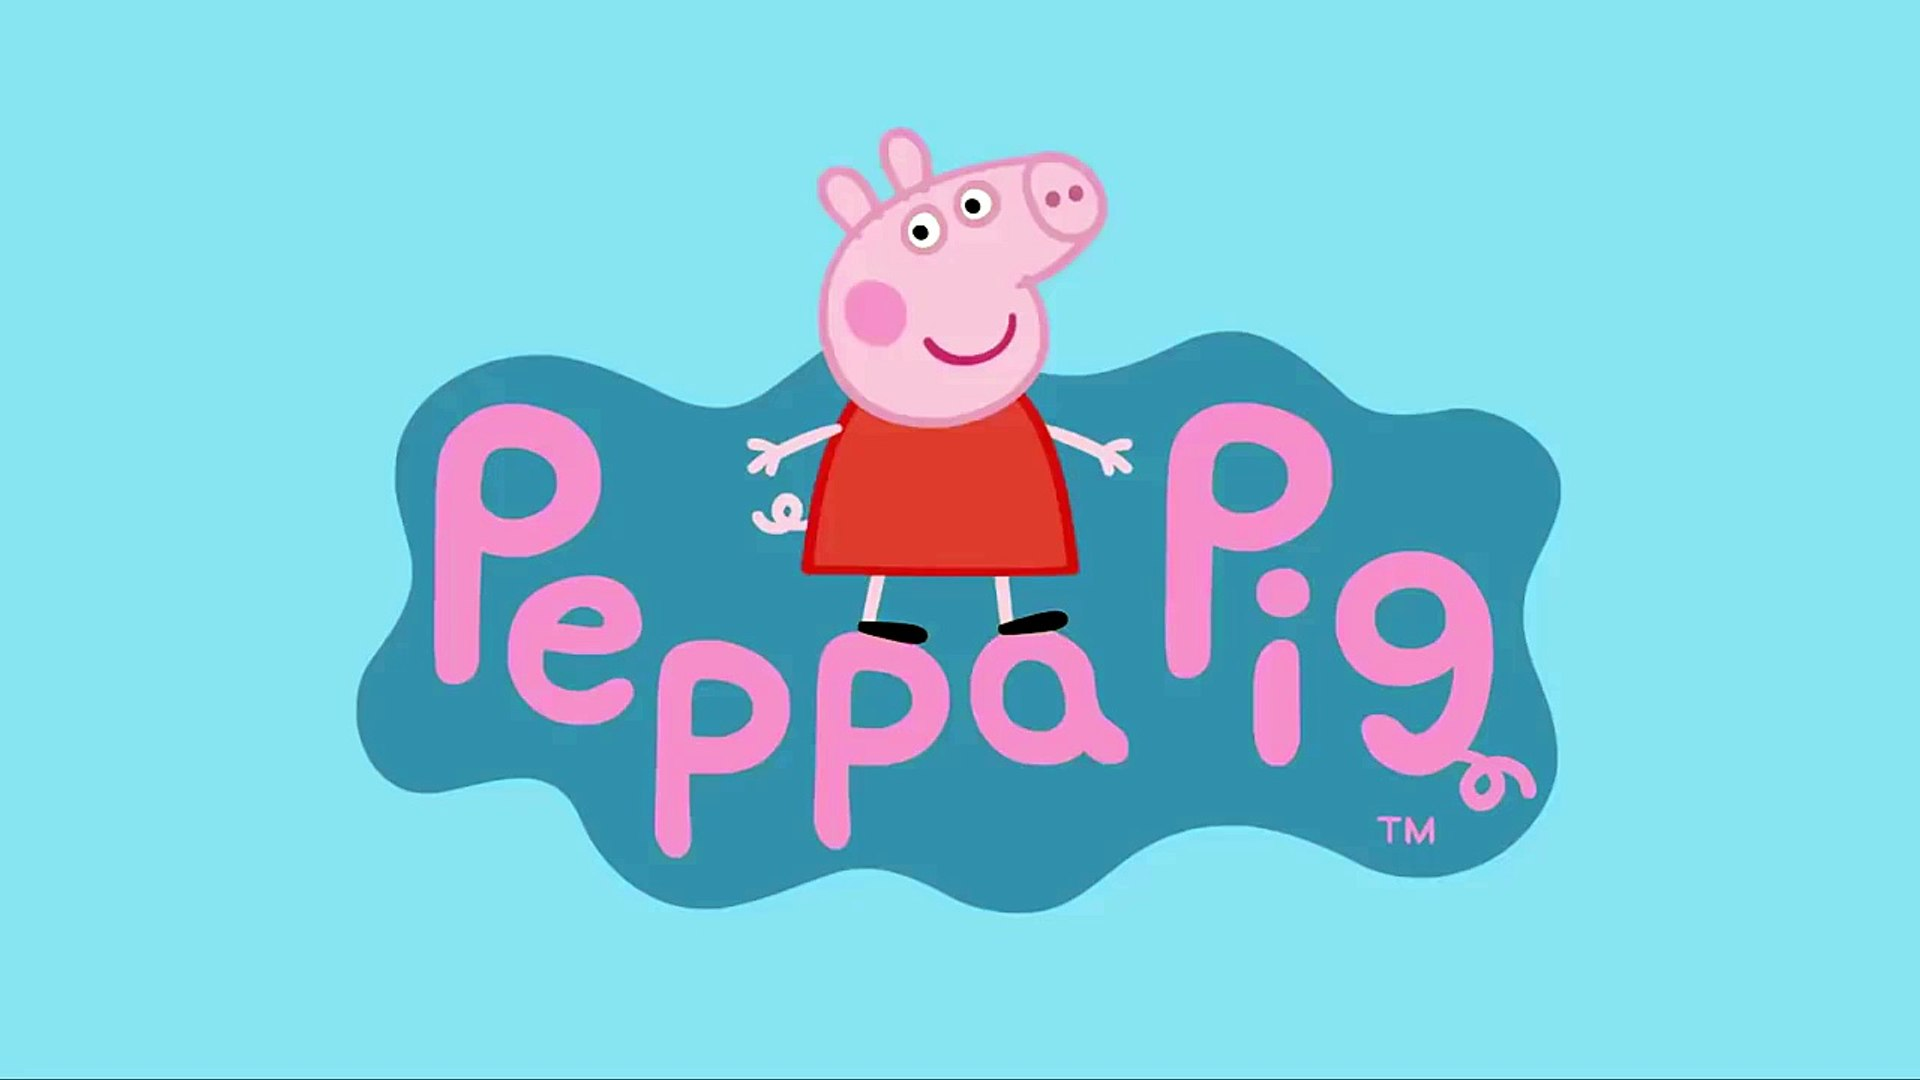 Meme John Cena Peppa Pig Video Dailymotion